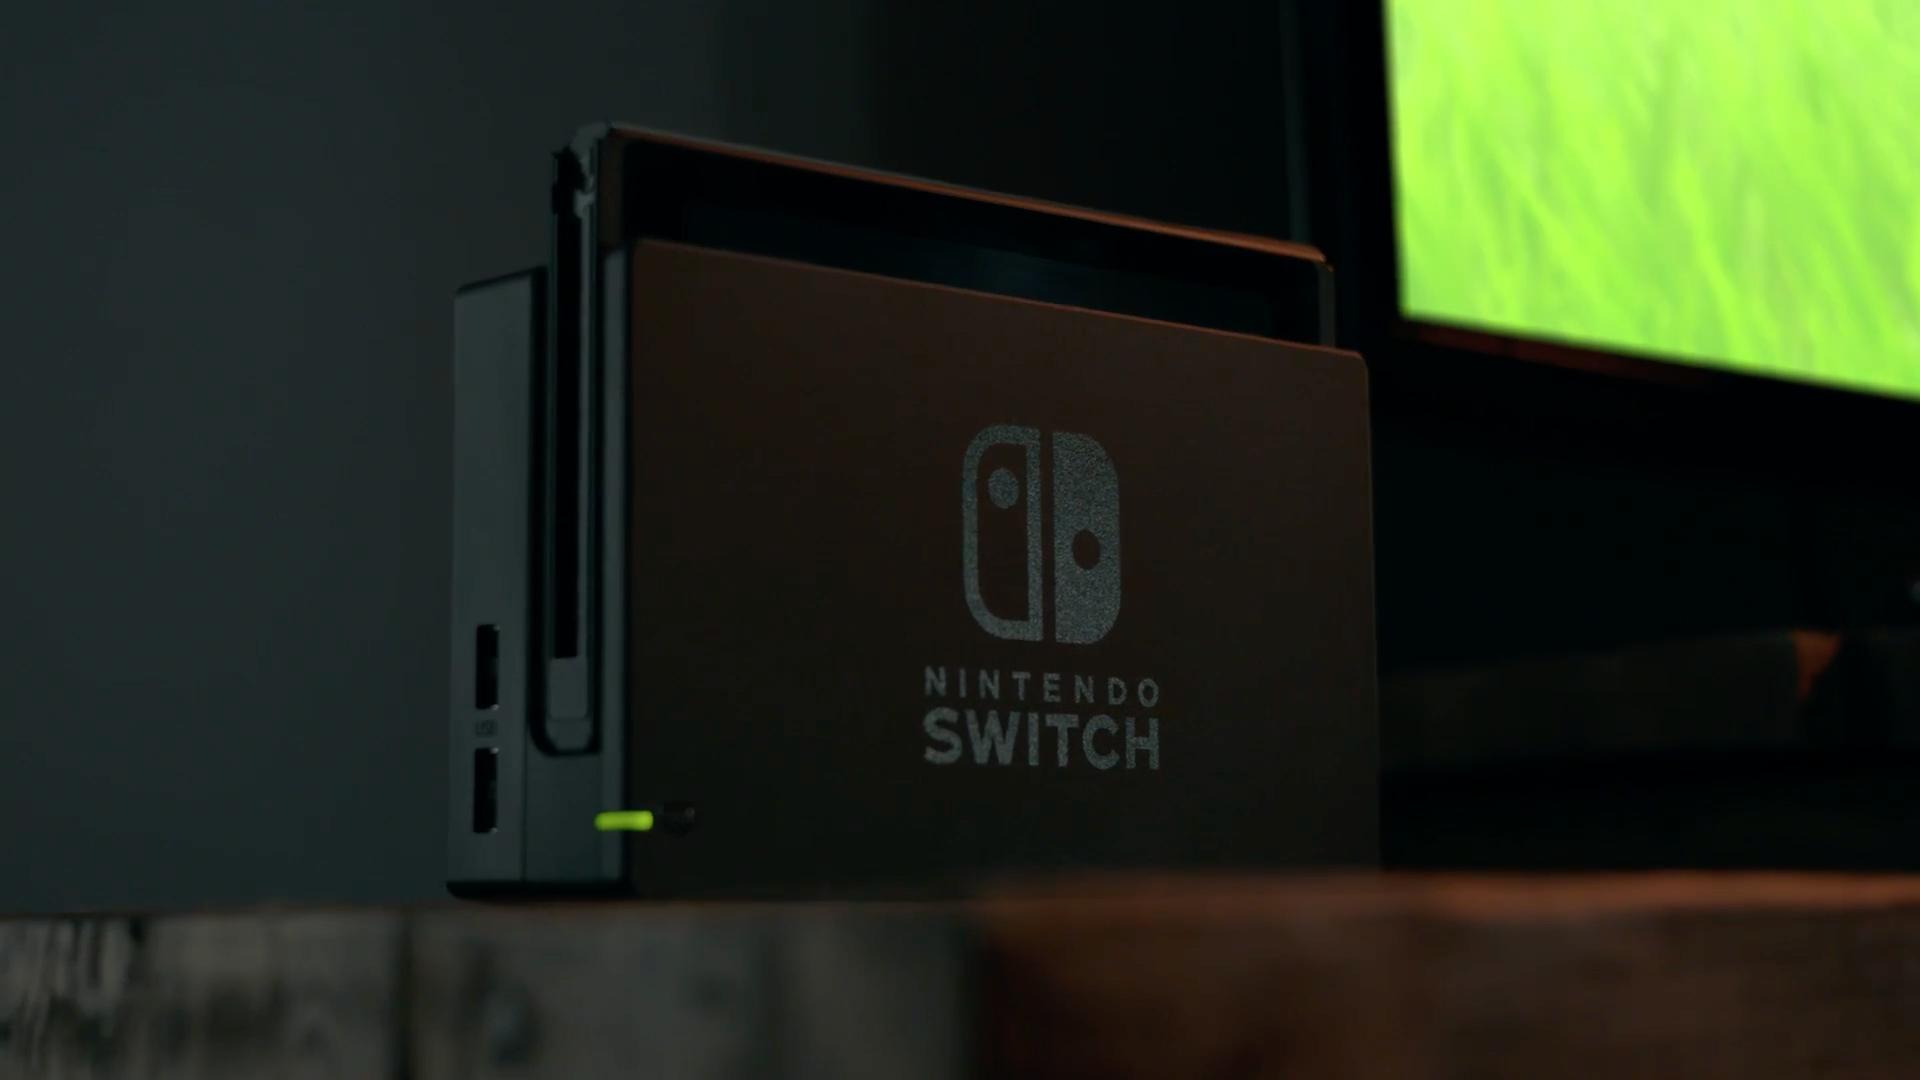 nintendo switch hd wallpaper 60386